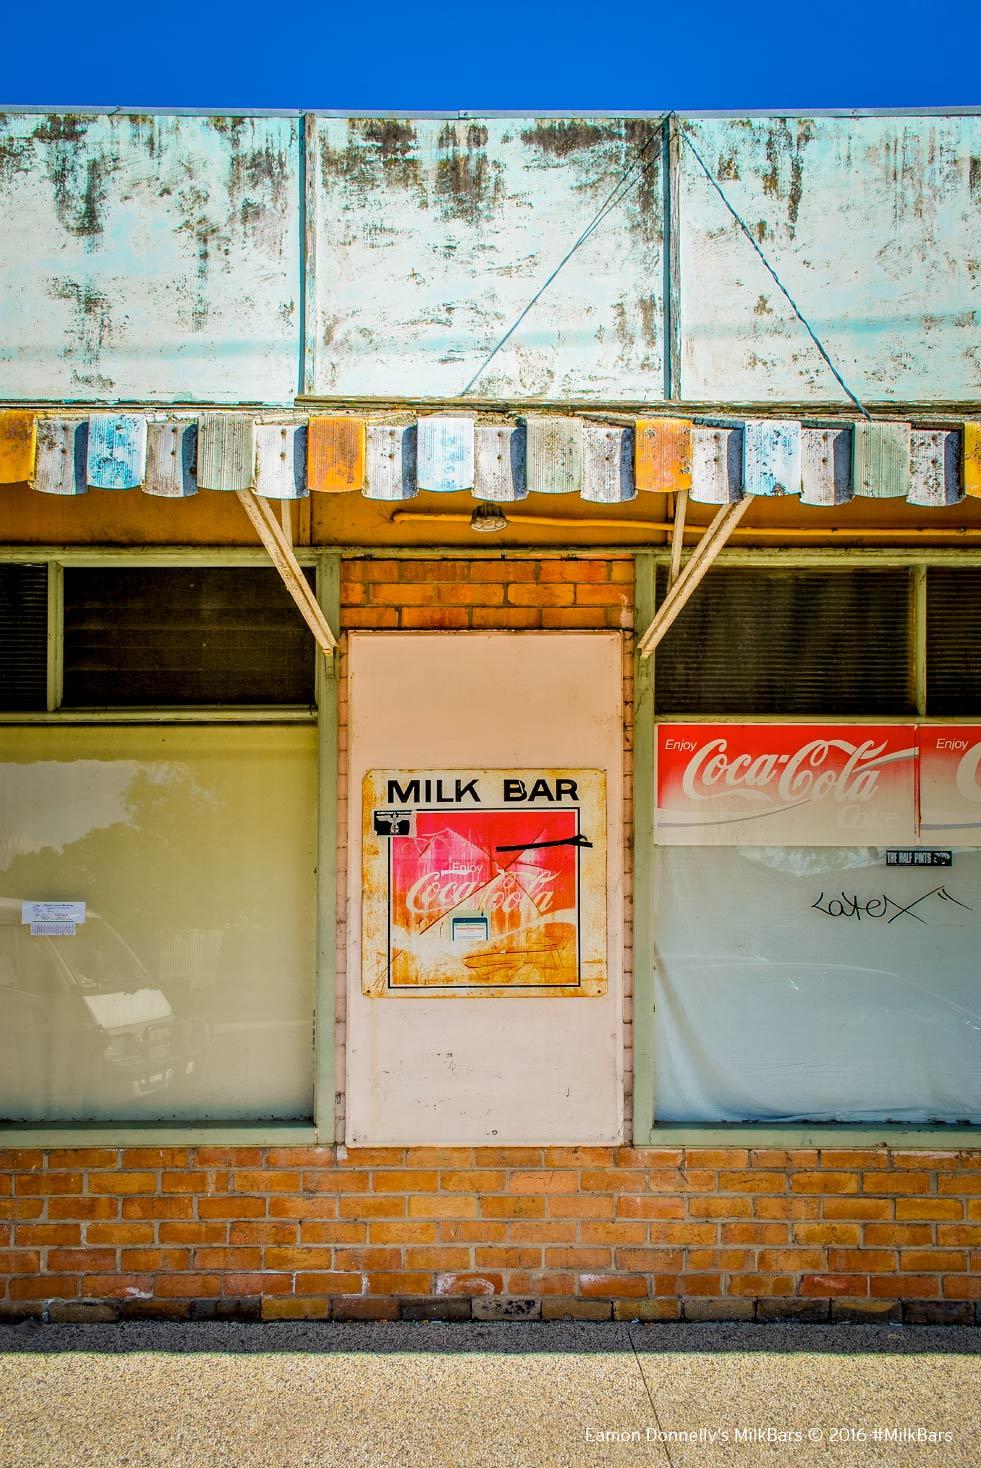 Bell-Park-Milk-Bar-Eamon-Donnelly's-Milk-Bars-Book-Project-(c)-2001-2016.jpg